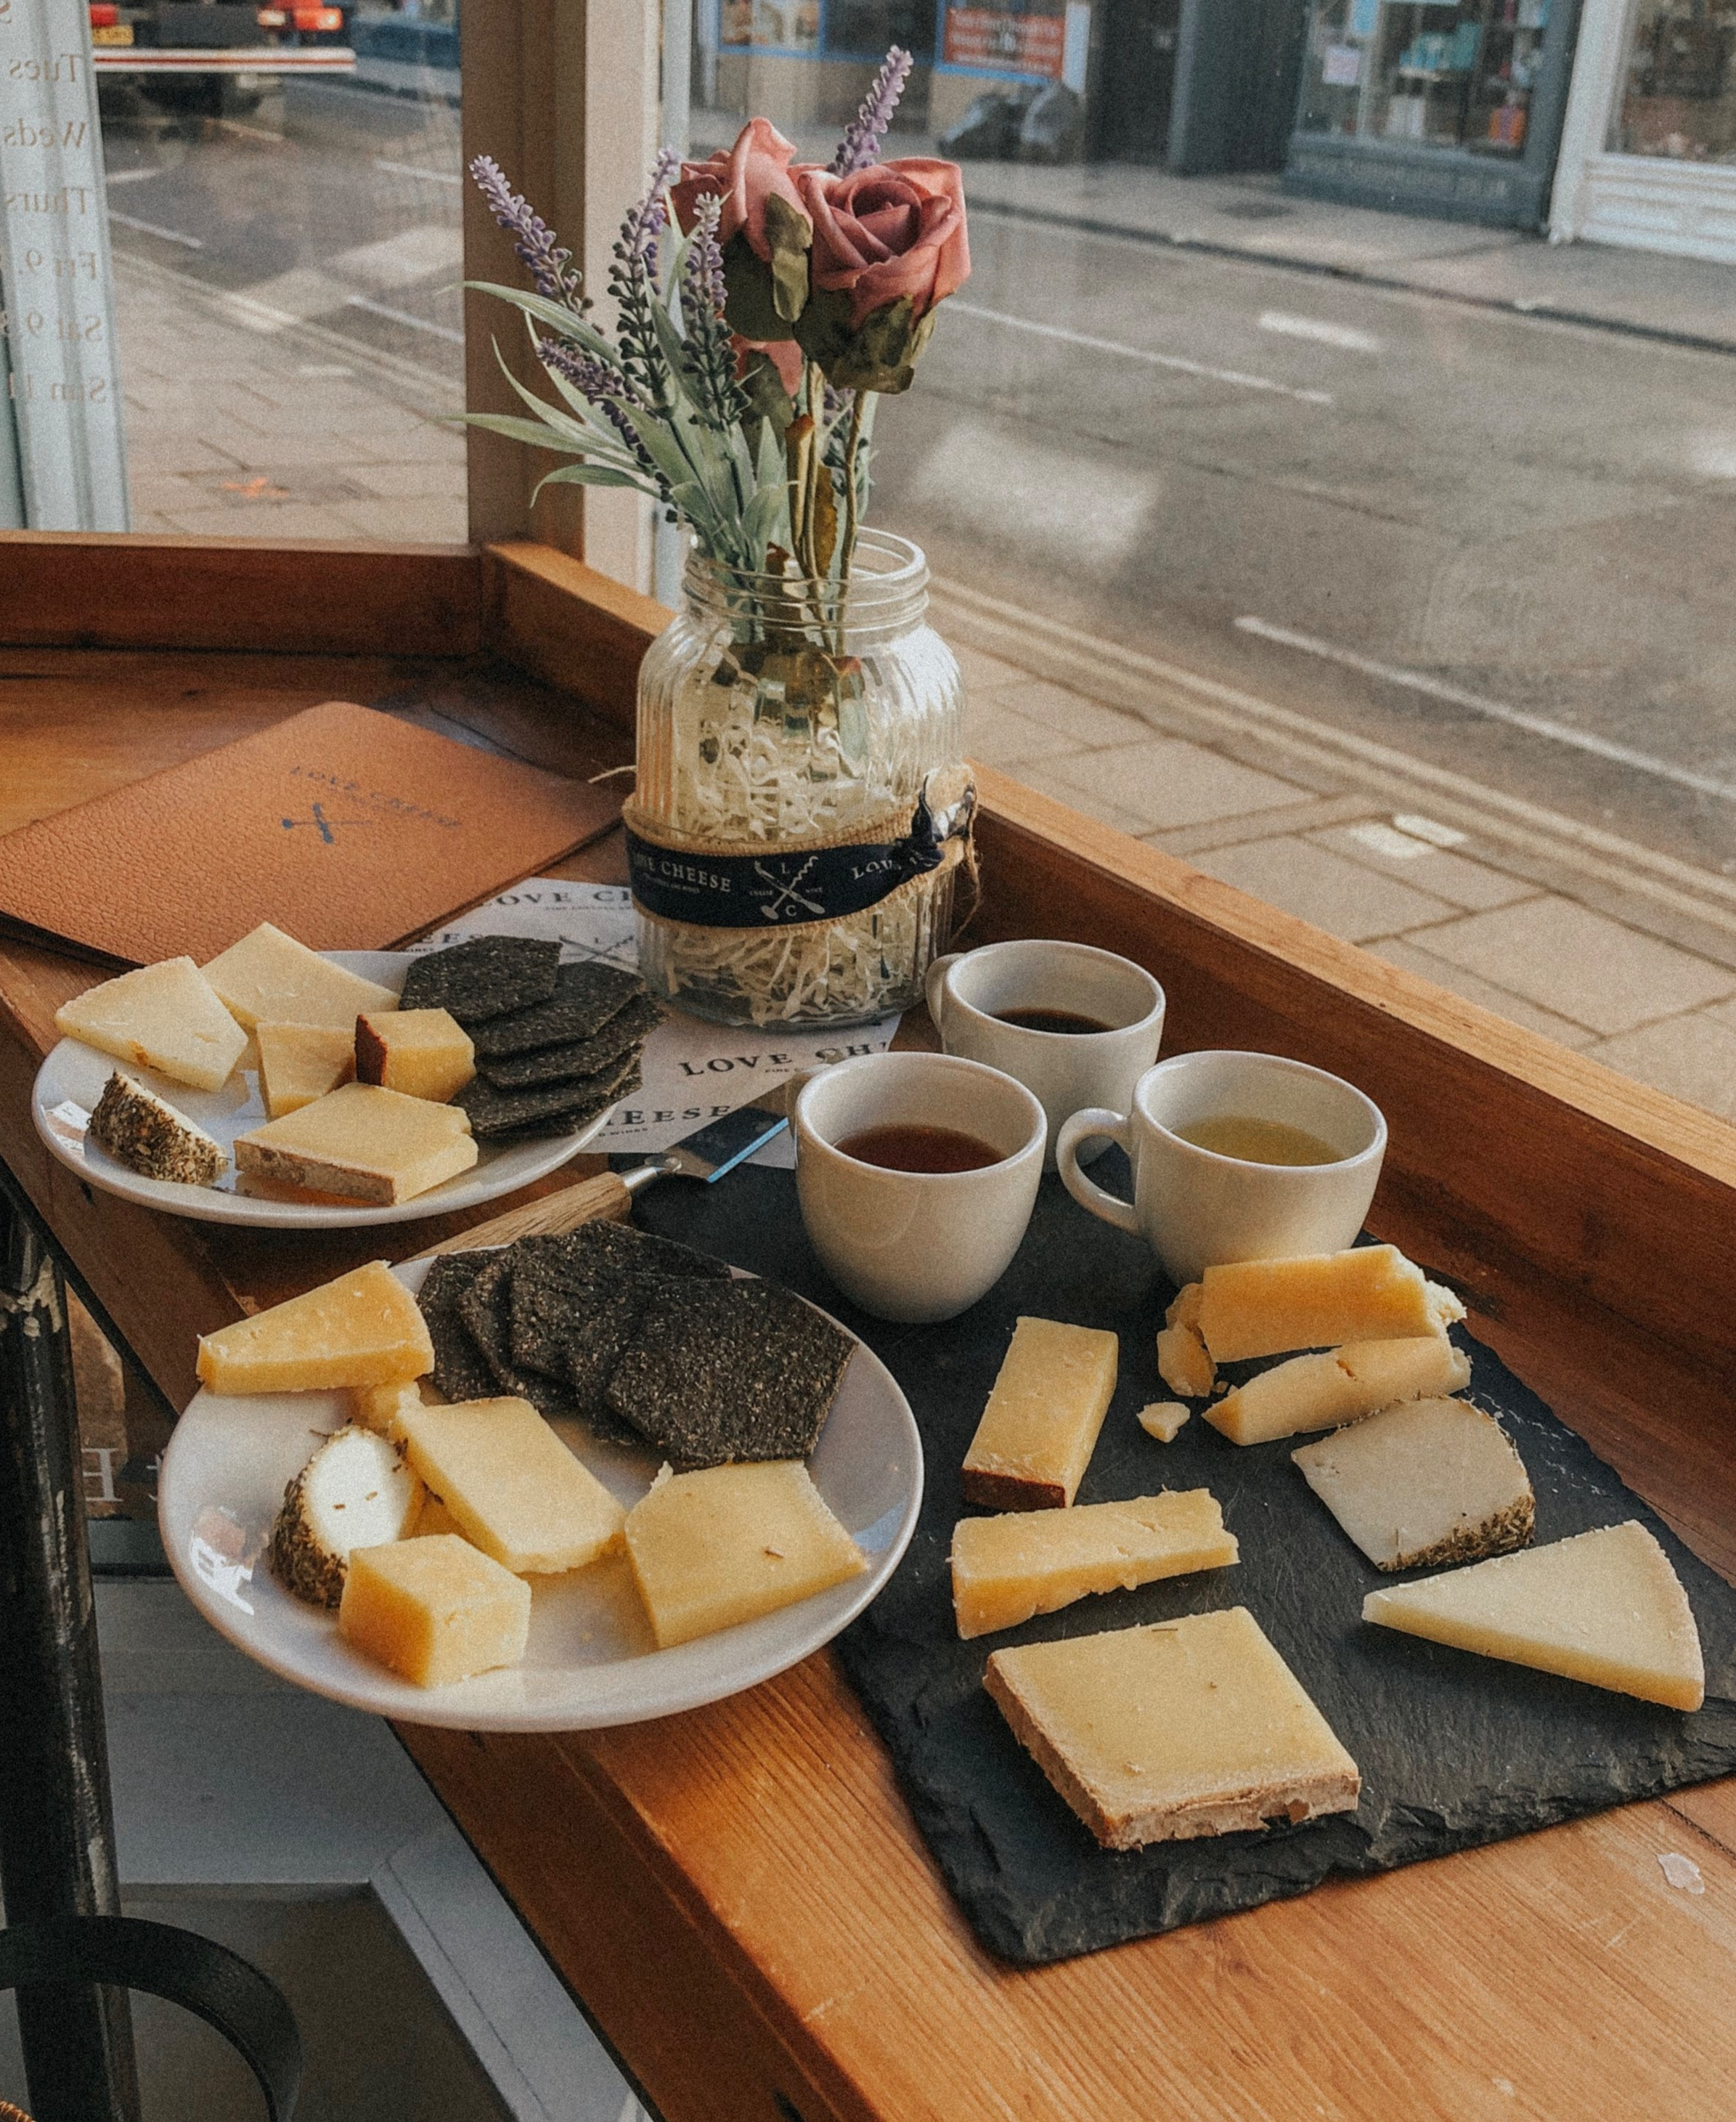 Comté, Doddingon, Fleur de Marquis, Mature Cheddar, Manchego cheeses